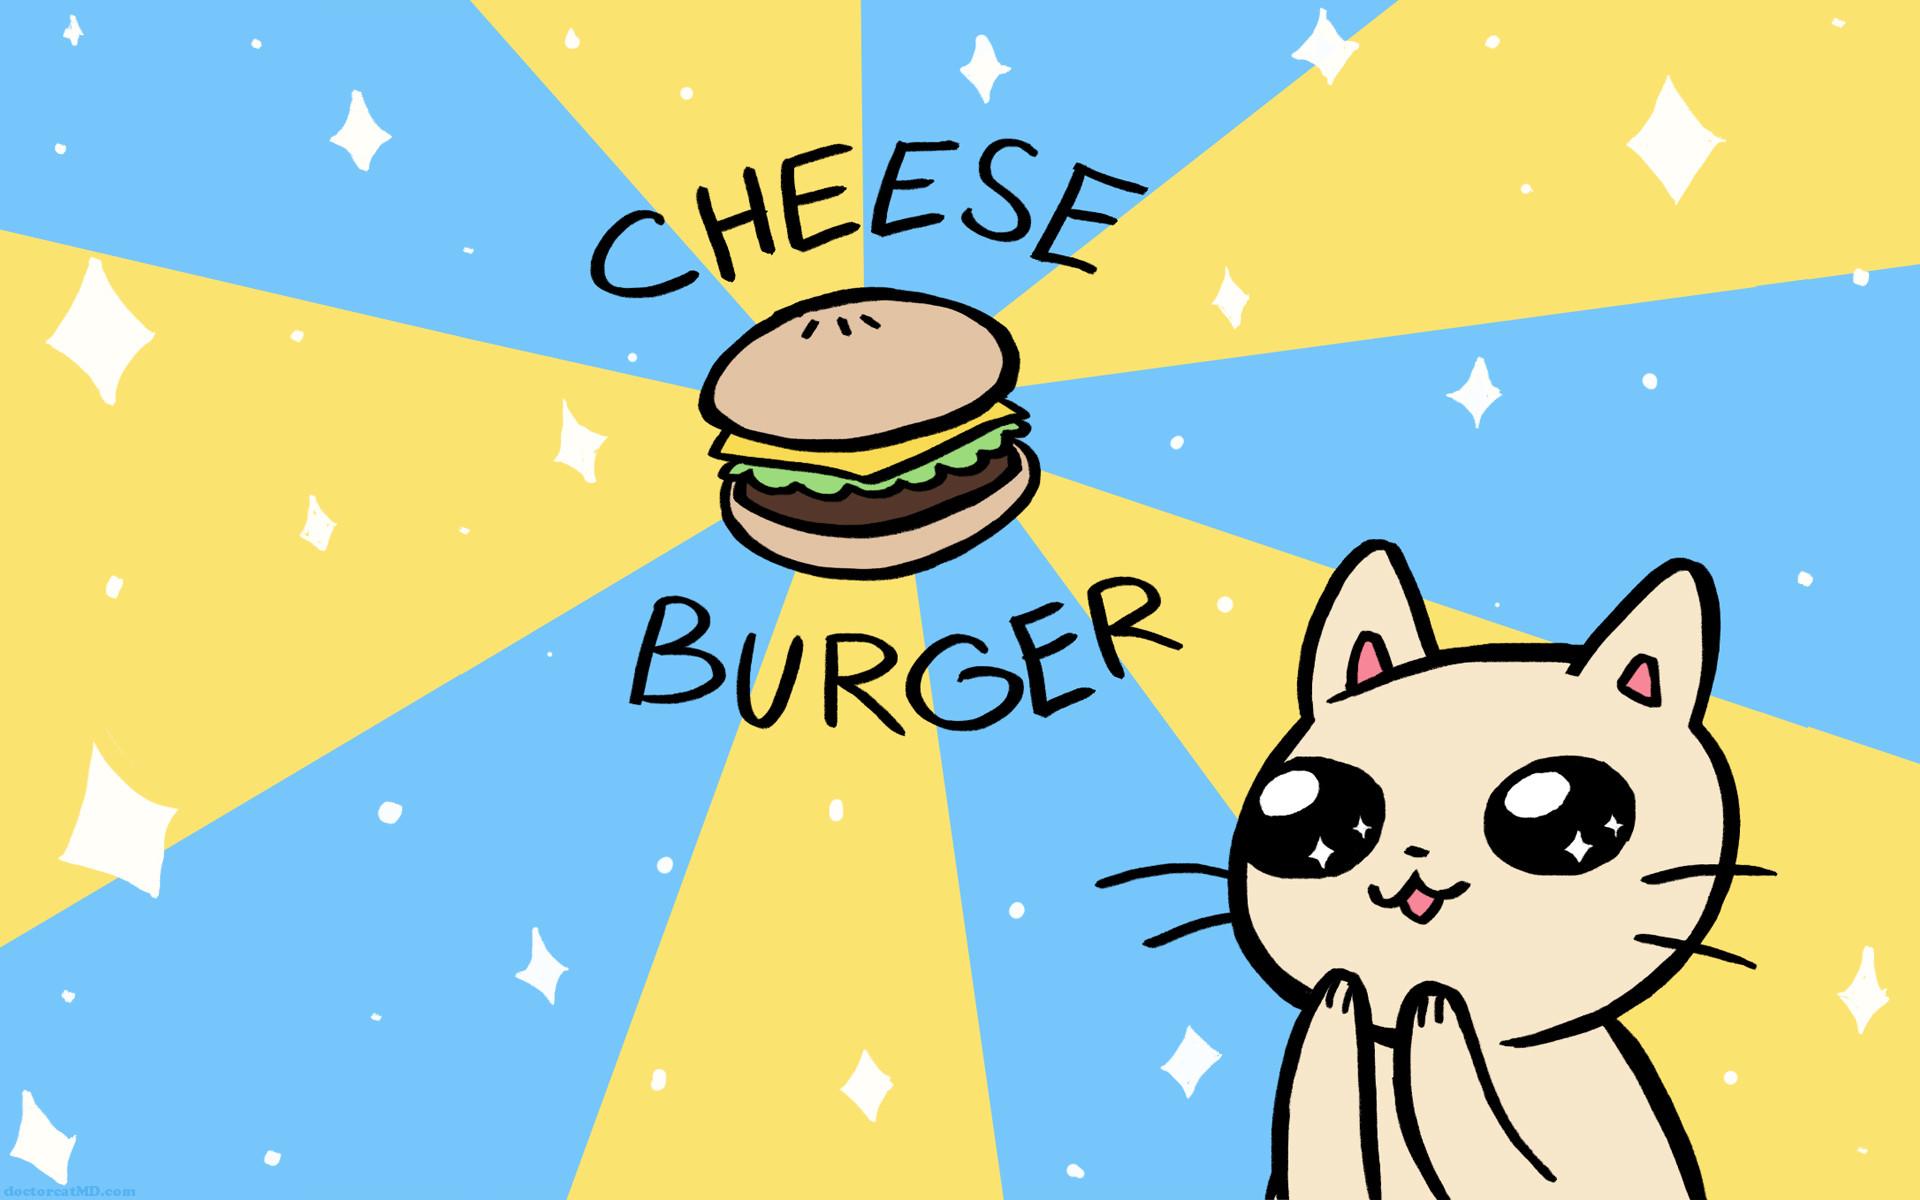 Cheeseburger Sparkle Wallpaper 16×10 …